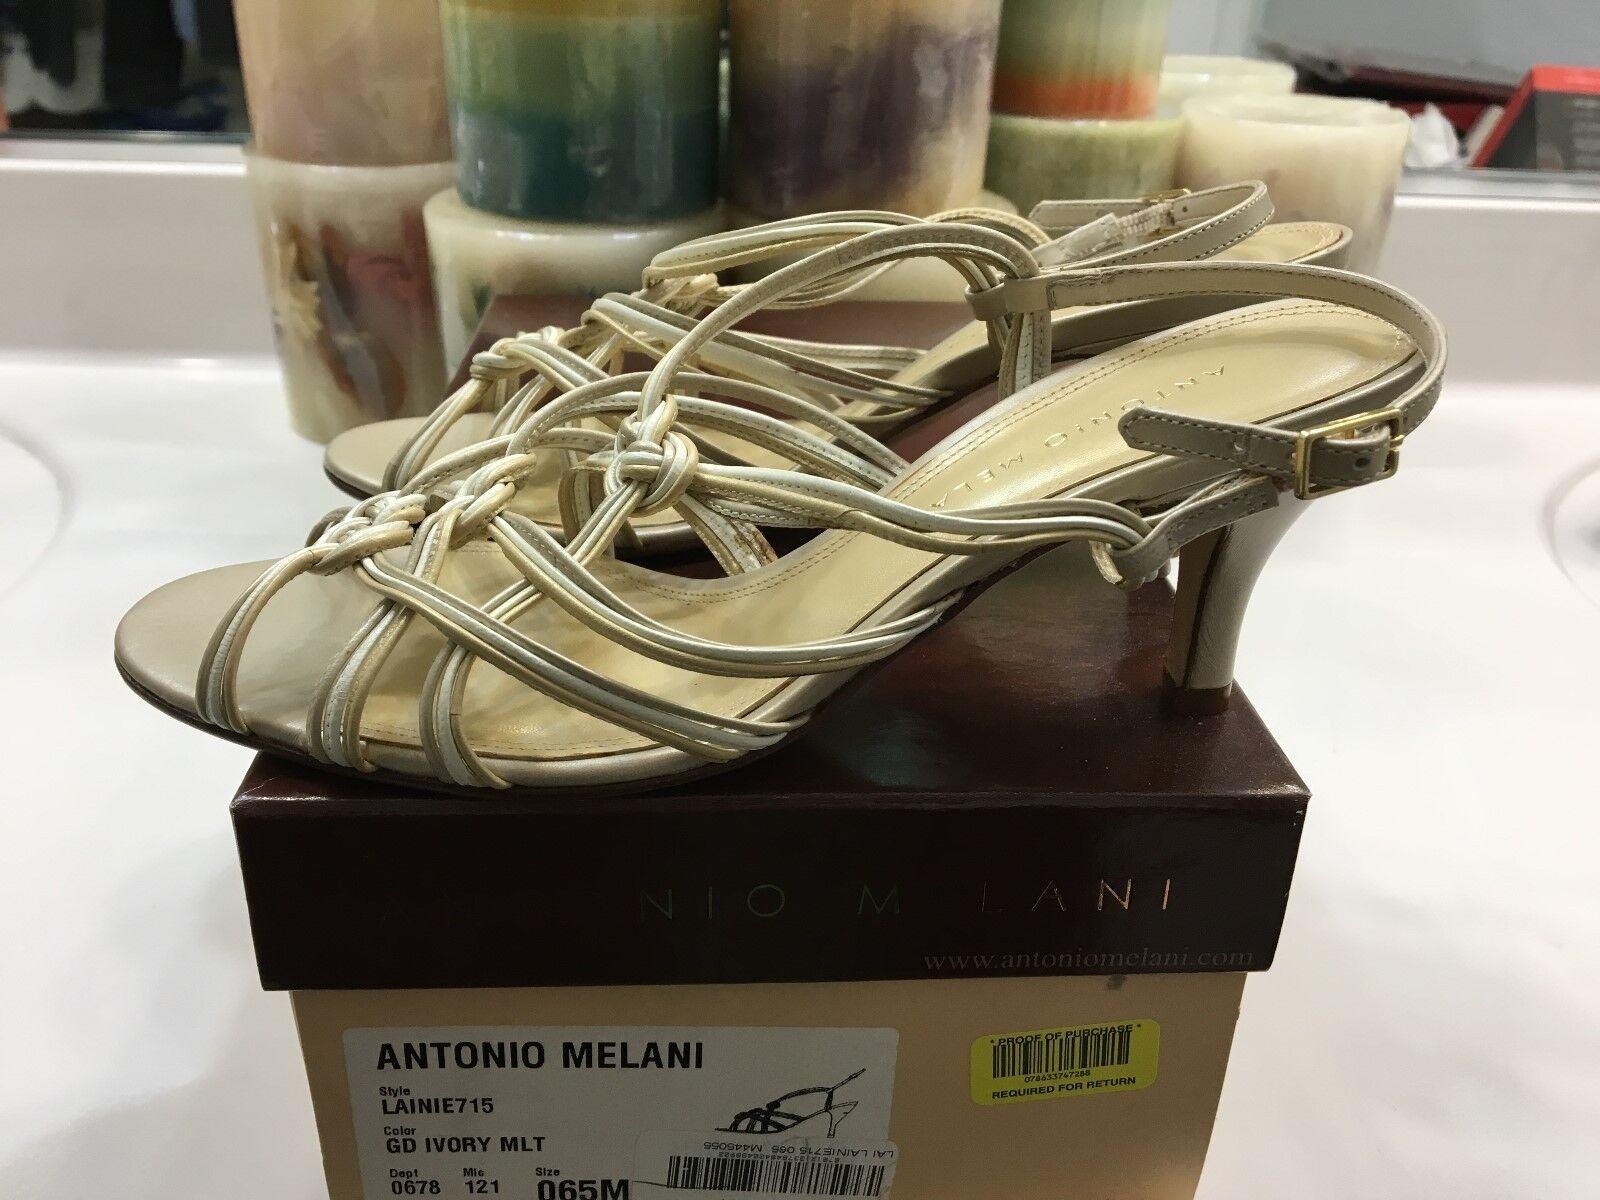 Antonio Melani Gold Ivory Lainie 715 Strappy Pumps NWOB (U.S. Size 6.5 M)